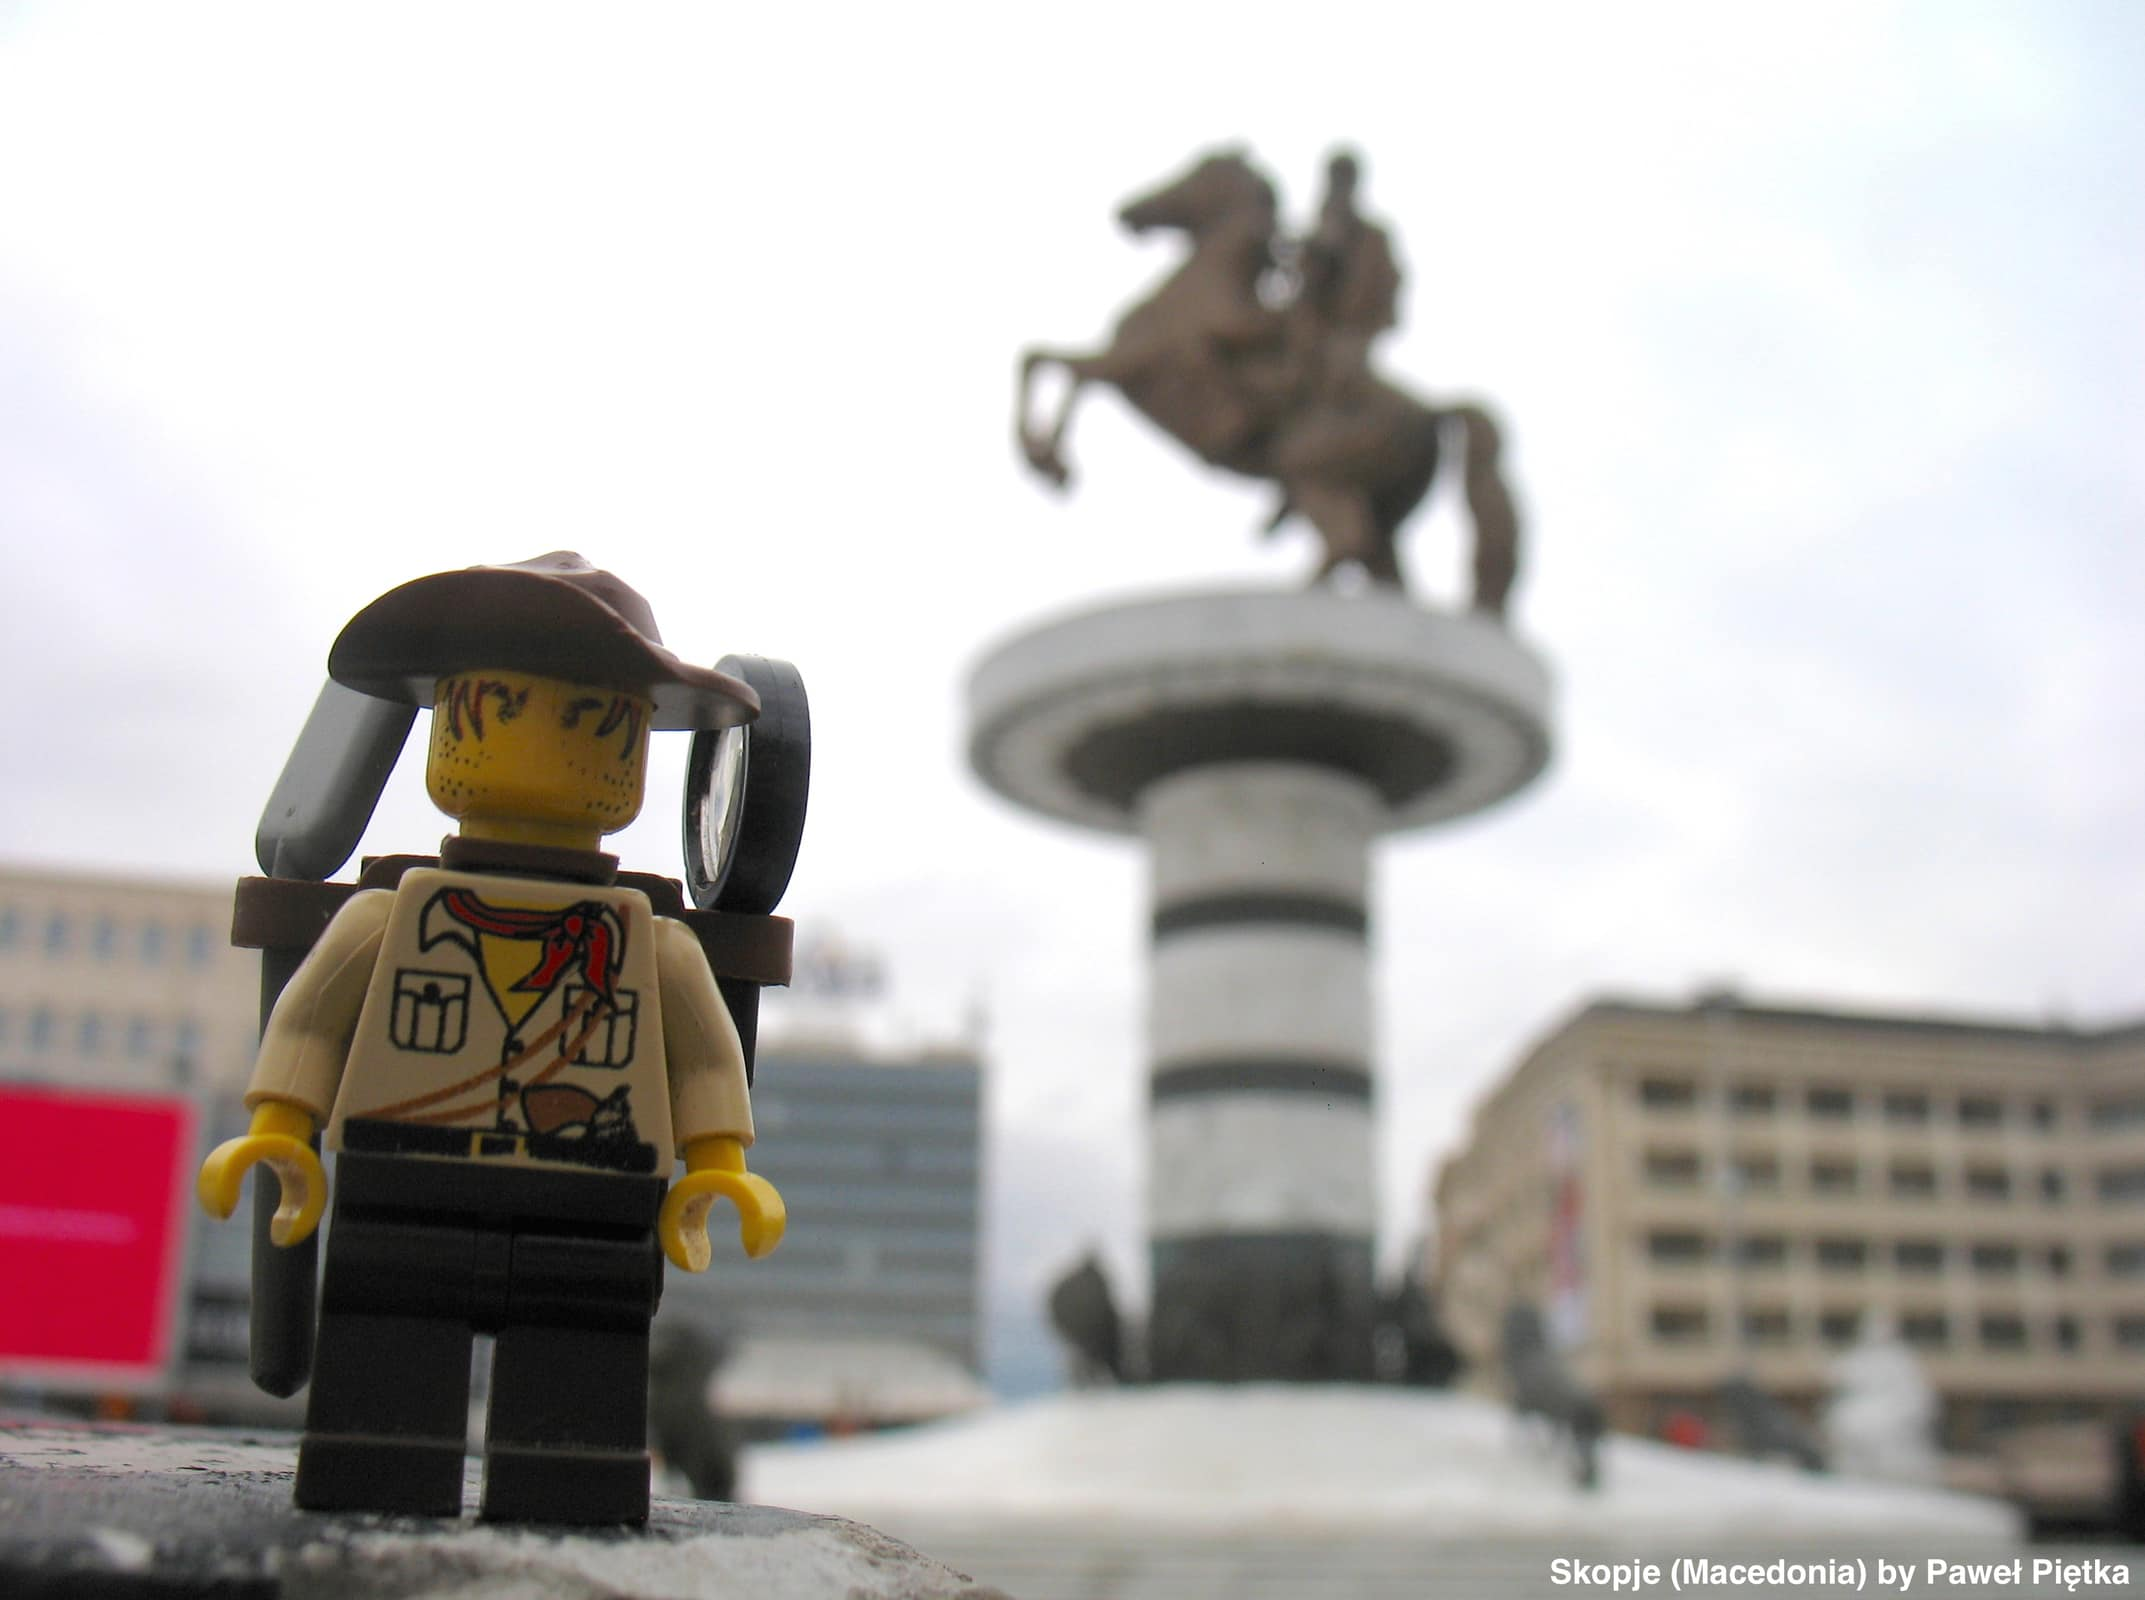 Skopje (Macedonia) - Macedonia Square Alexander the Great